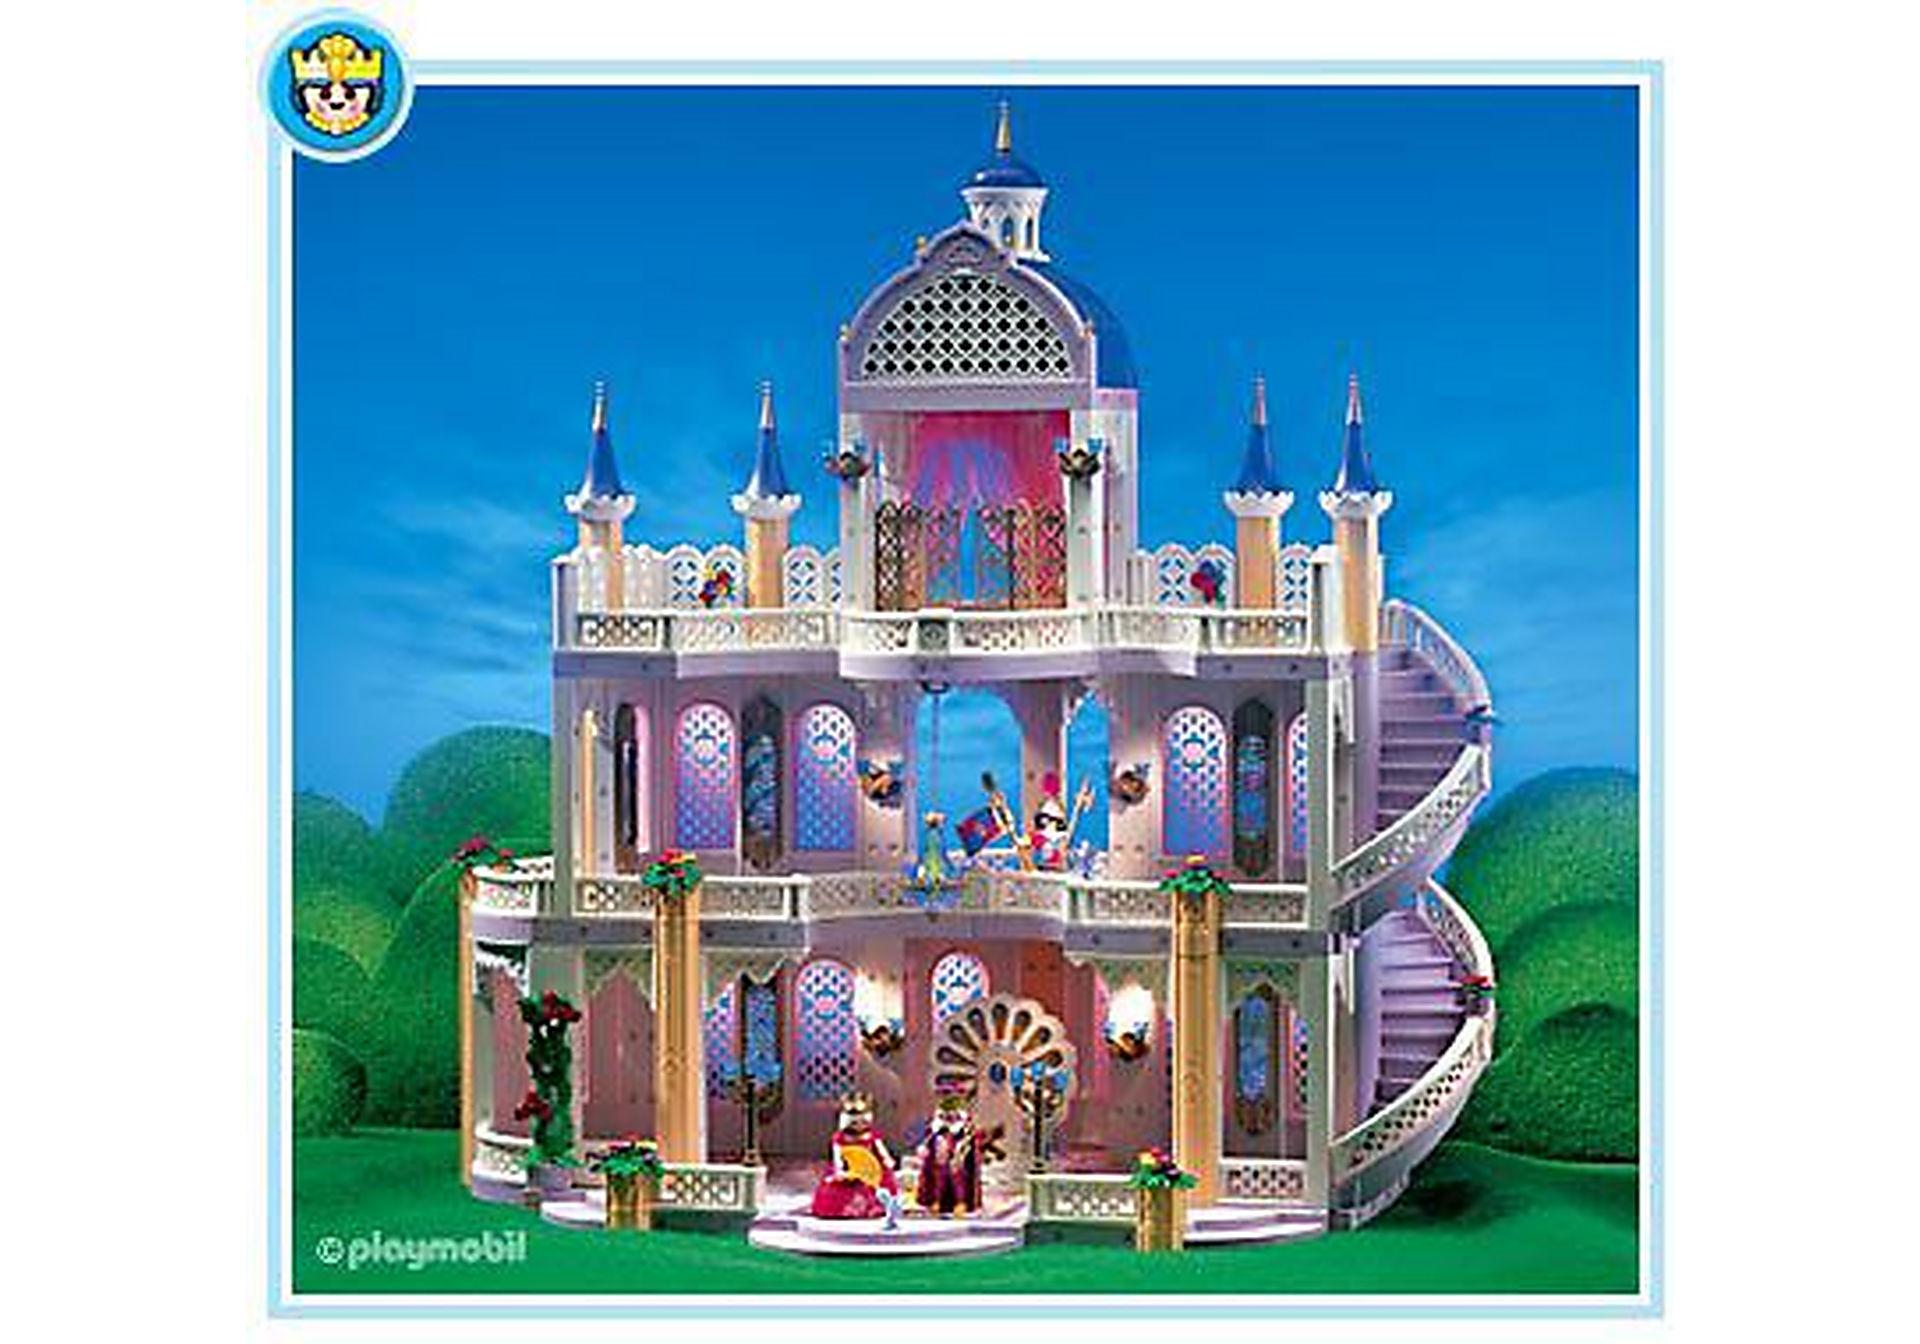 http://media.playmobil.com/i/playmobil/3019-A_product_detail/Palais des merveilles